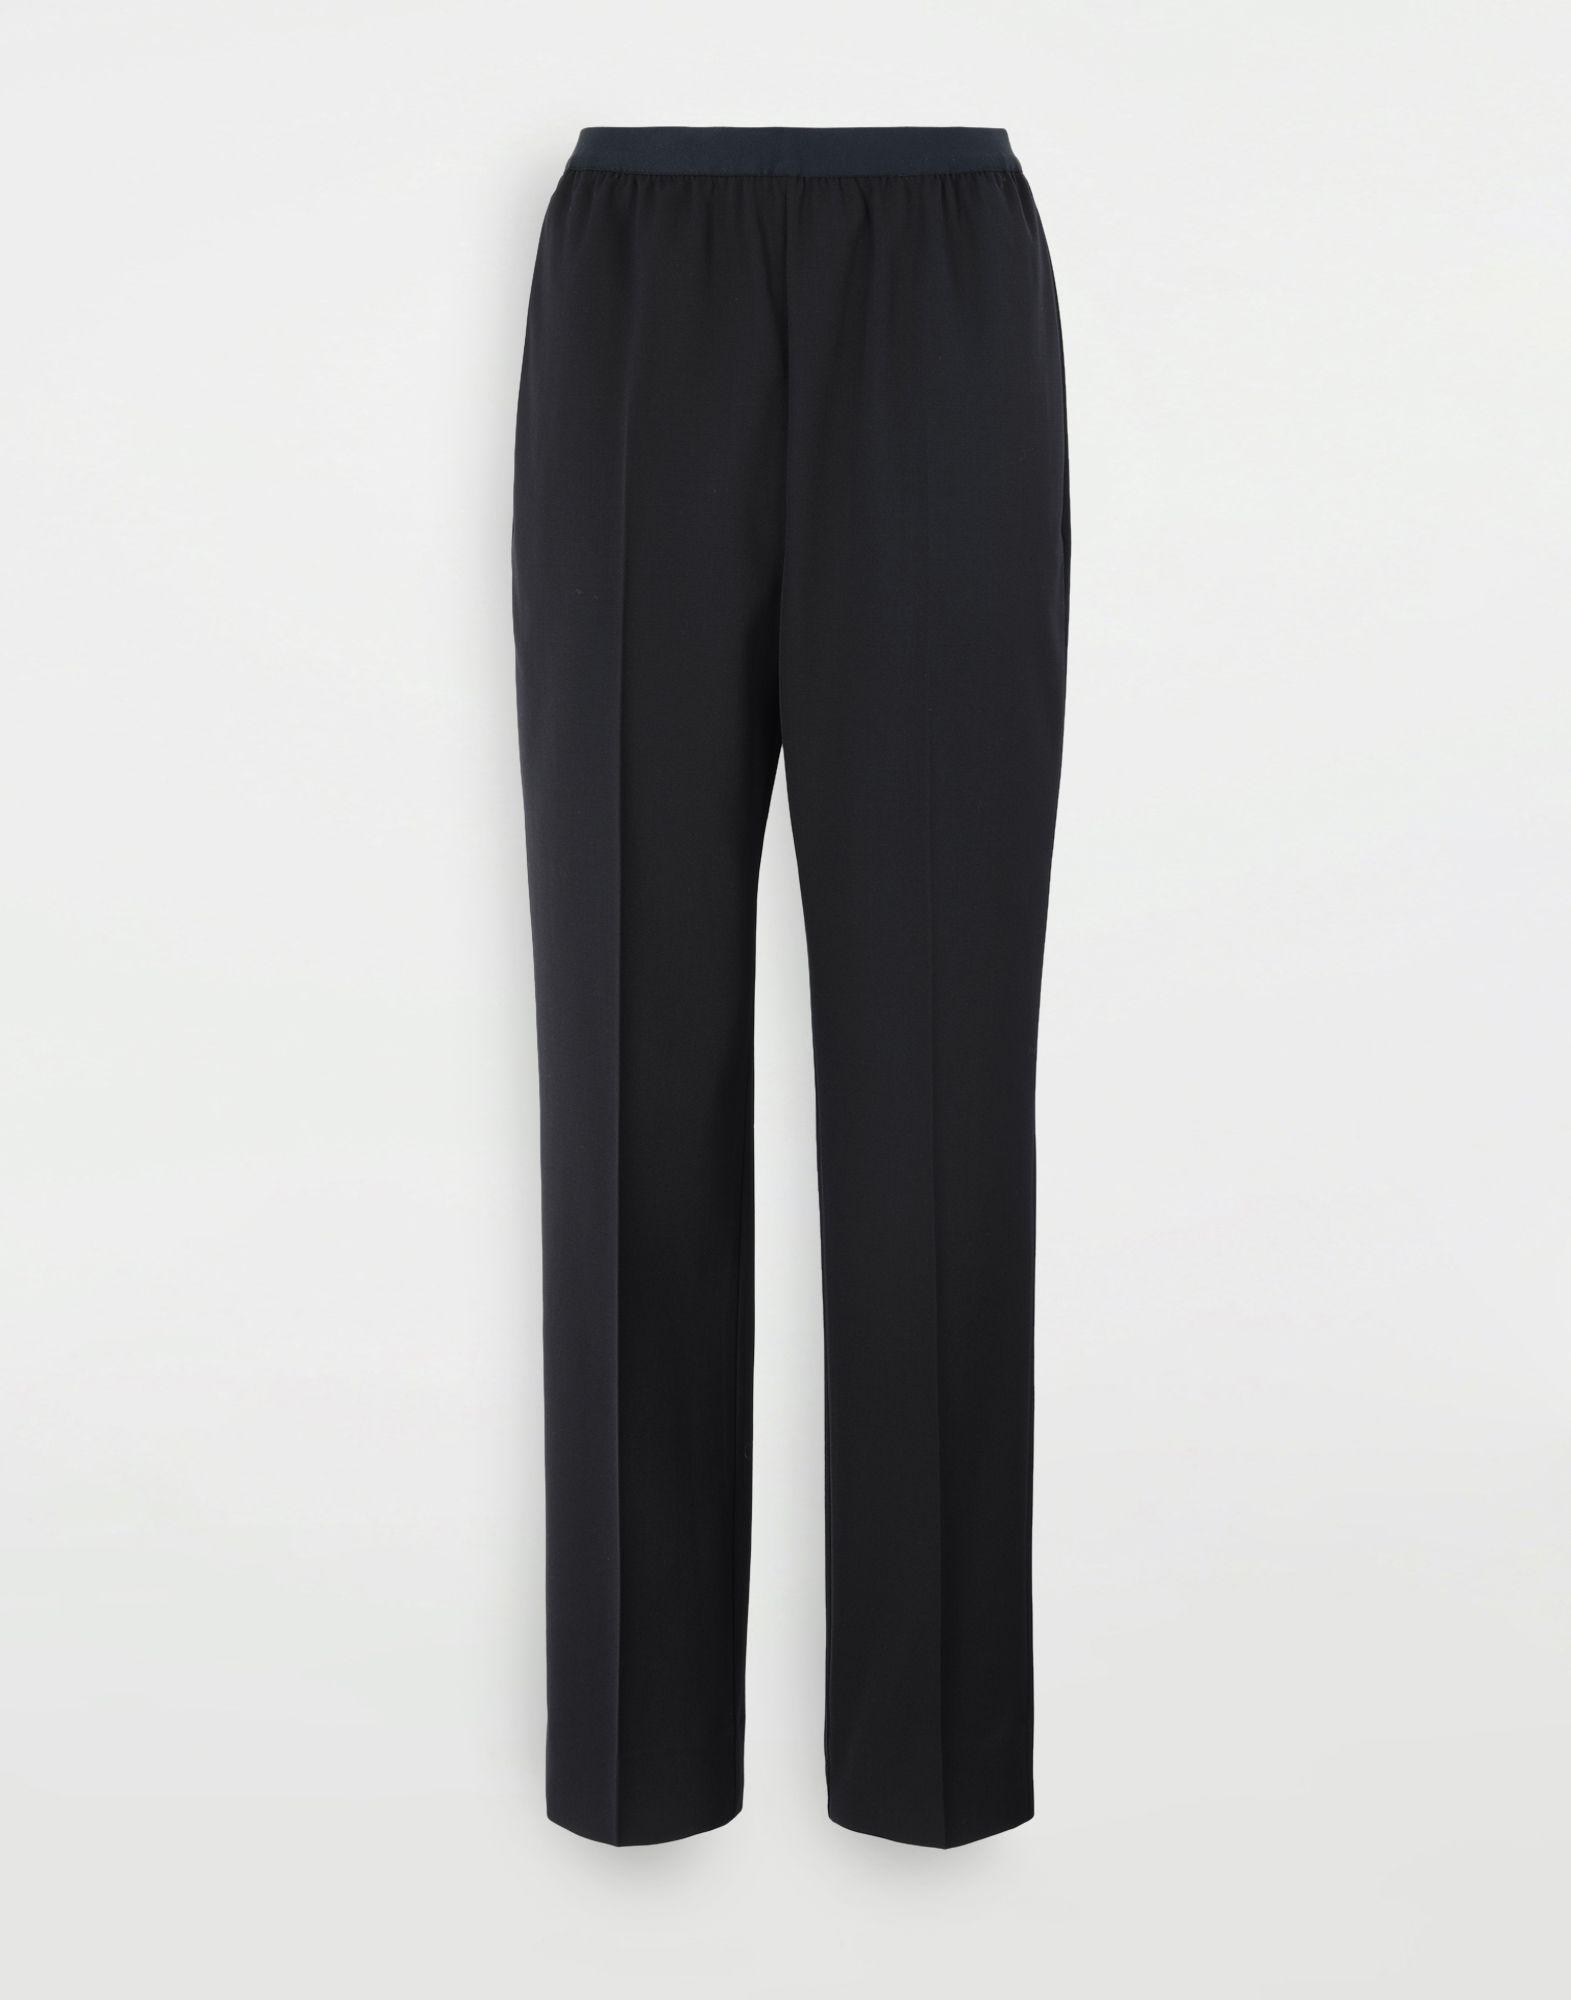 MAISON MARGIELA Pleated trousers Trousers Woman f